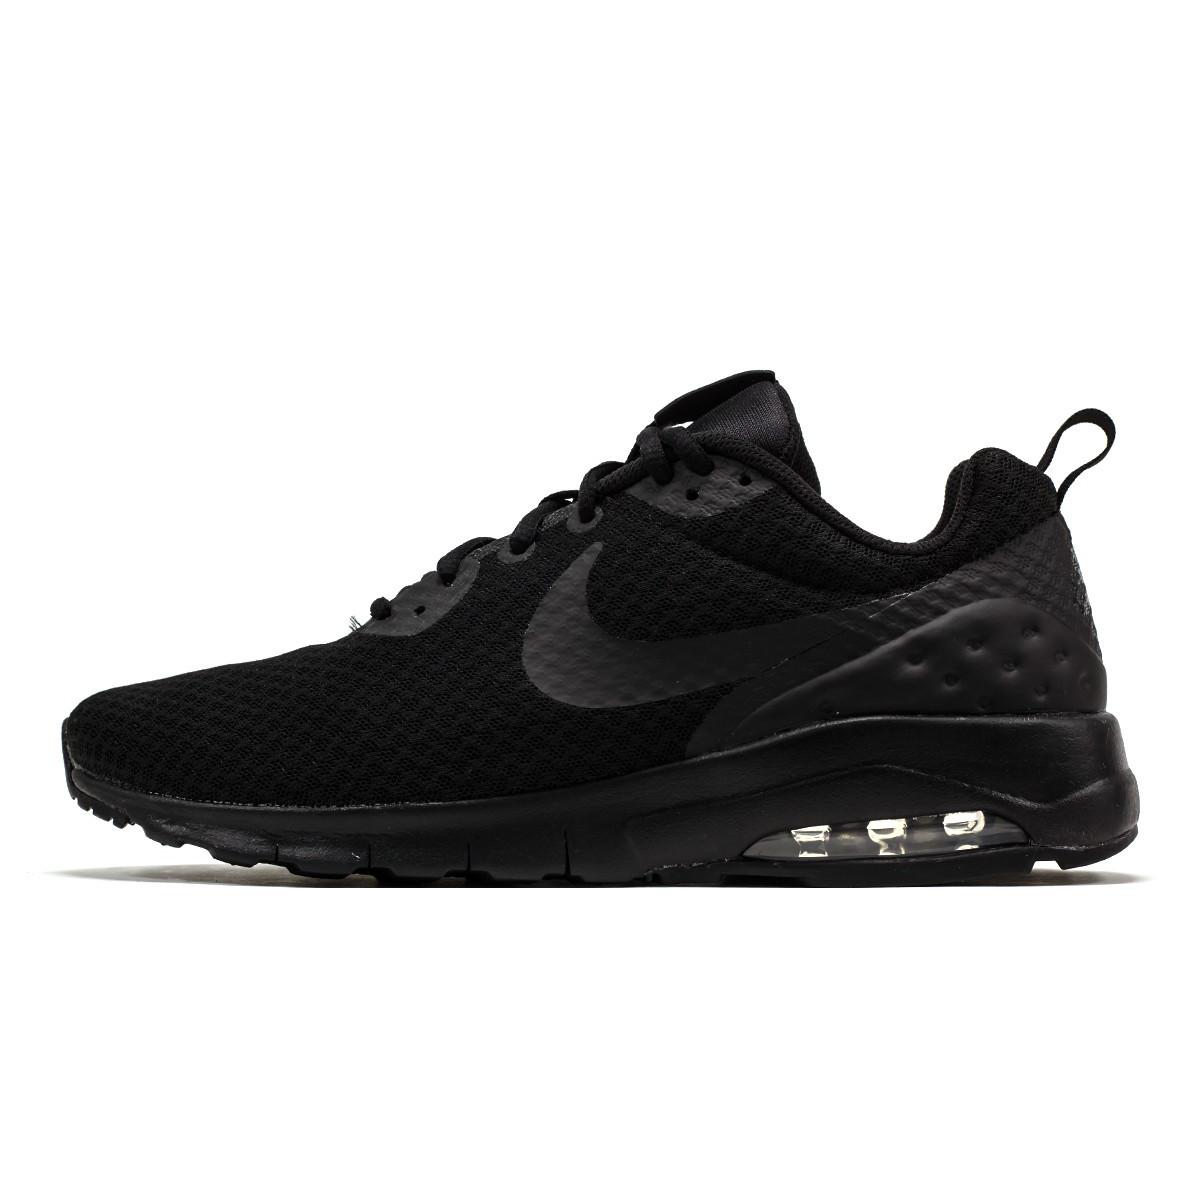 7e08b65f Купить Мужские кроссовки NIKE air max motion lw (Артикул: 833260-002 ...